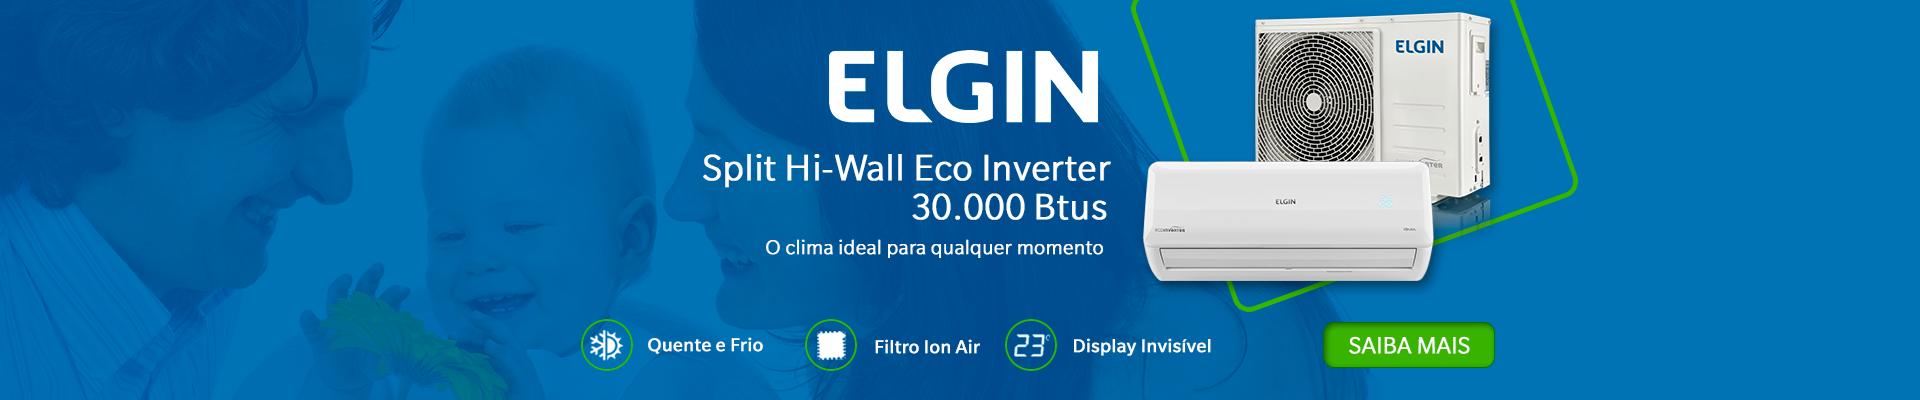 Elgin Split Hi-Wall Eco Inverter 30.000